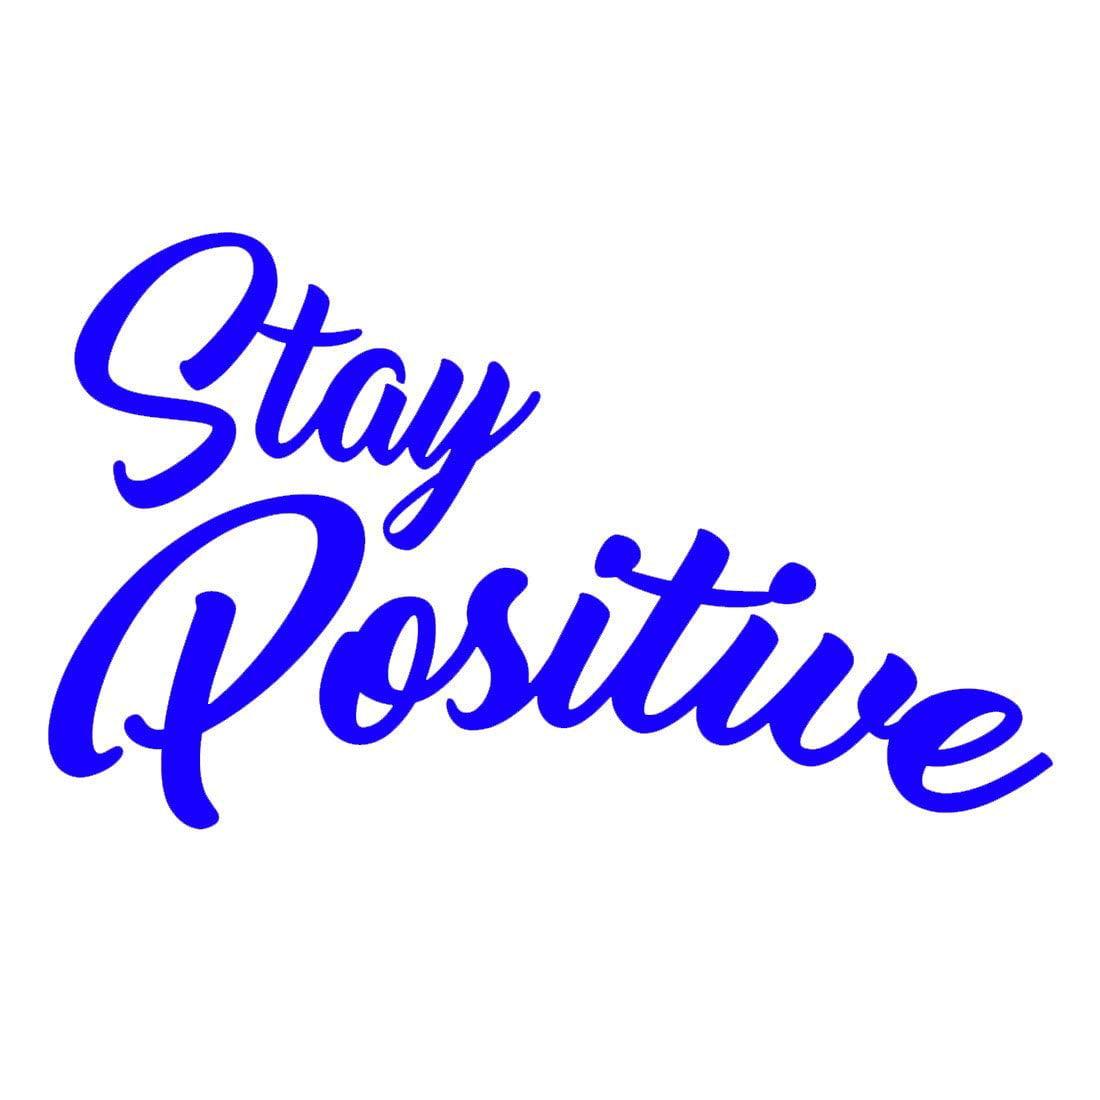 "VWAQ Stay Positive Vinyl Wall Decal, Uplifting Positivity Wall Decor -18120 (Hot Pink, 18"" H X 30"" W)"